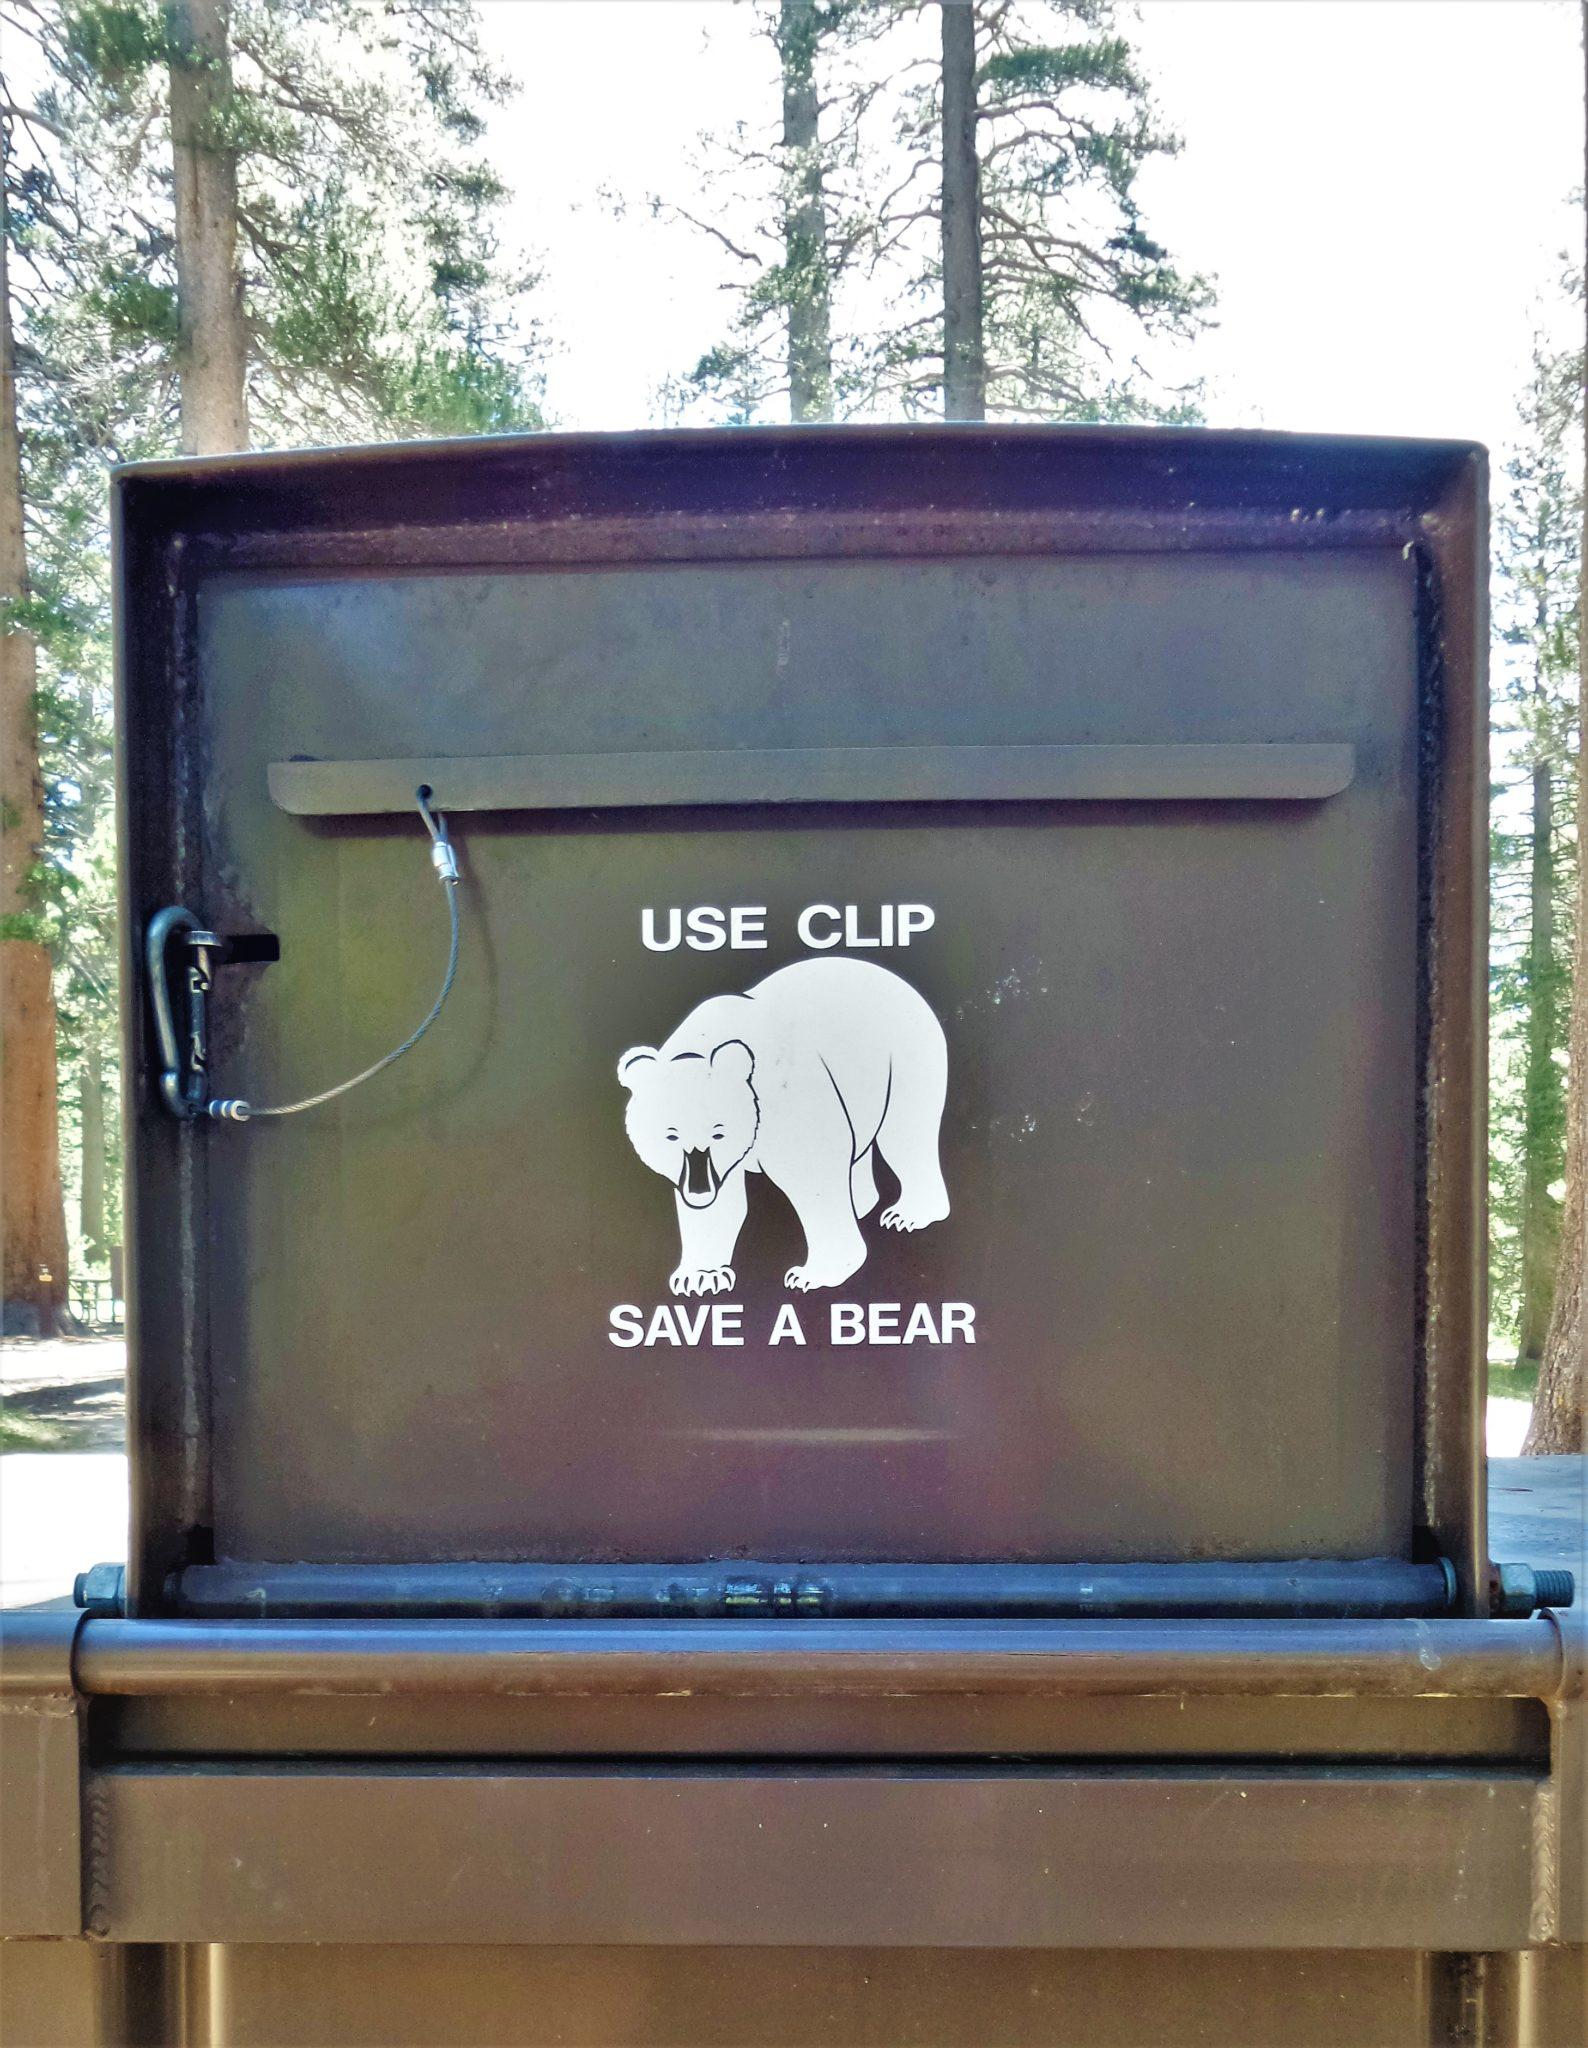 Use clip save a bear sign, Yosemite National Park, California